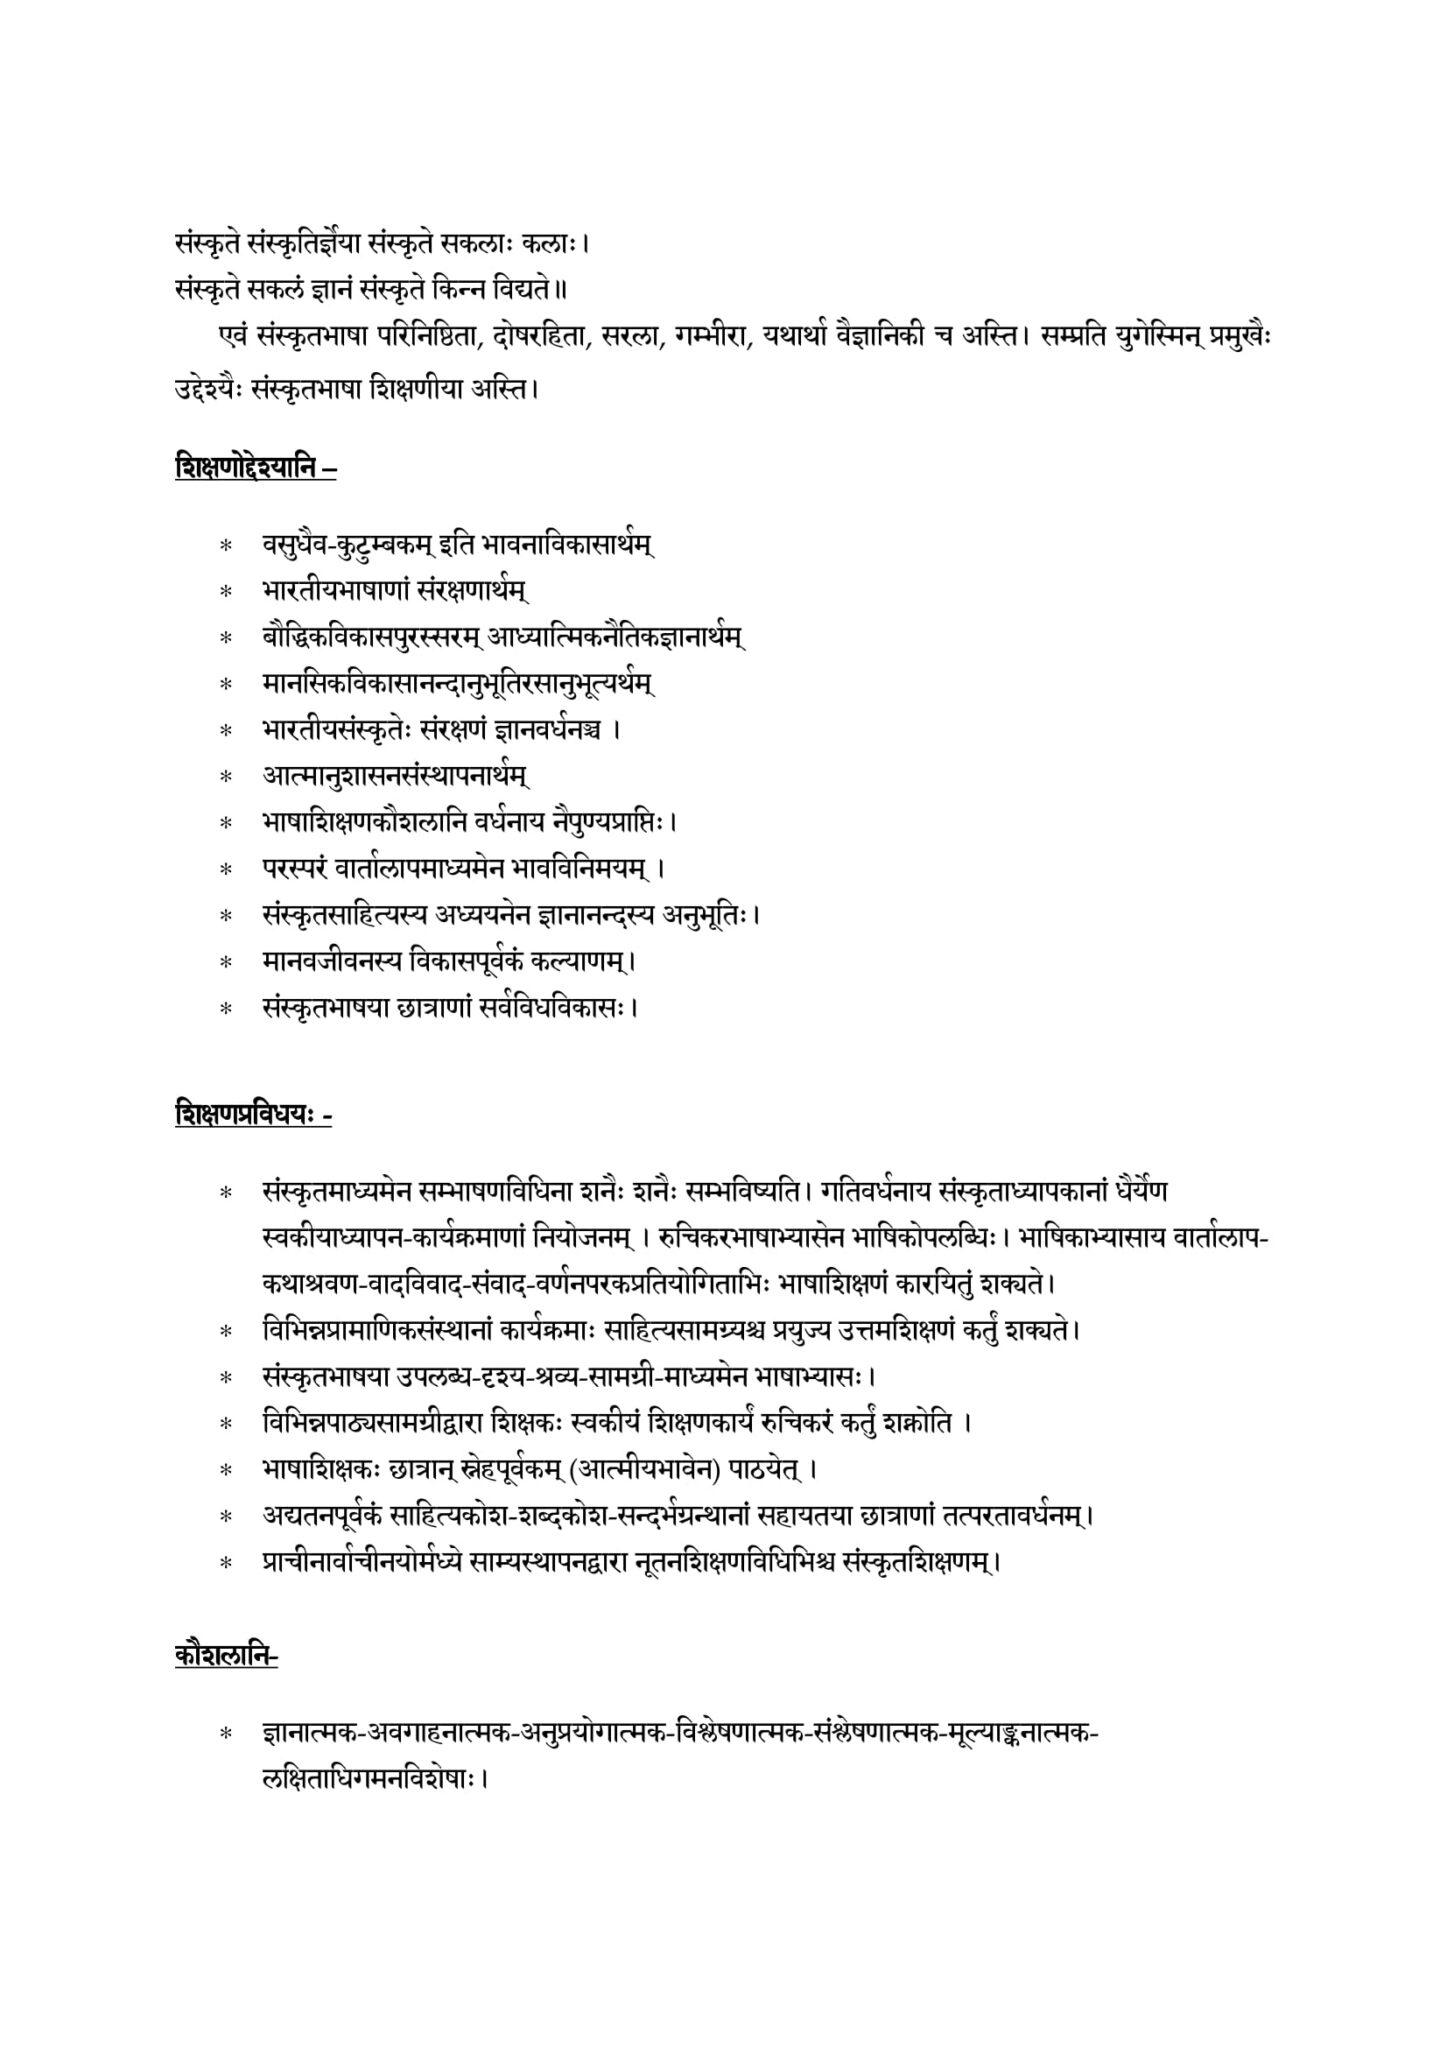 Sanskrit Sec 2020 21 class 9 10 02